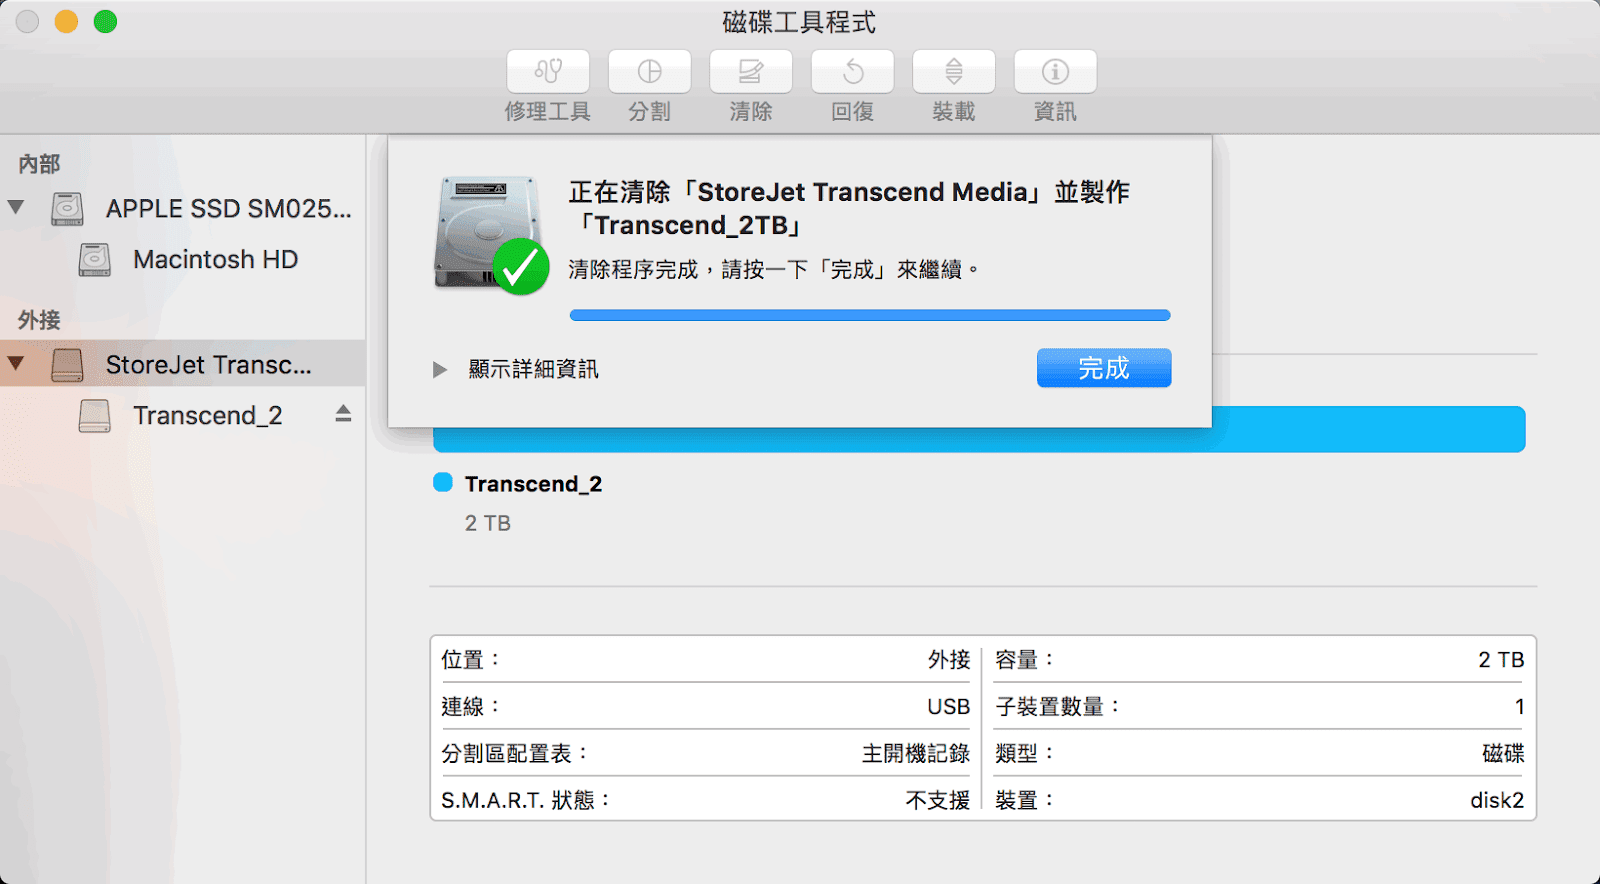 ExFAT格式 - 讓Windows,Mac OS共用隨身碟或外接硬碟 - 靖.技場